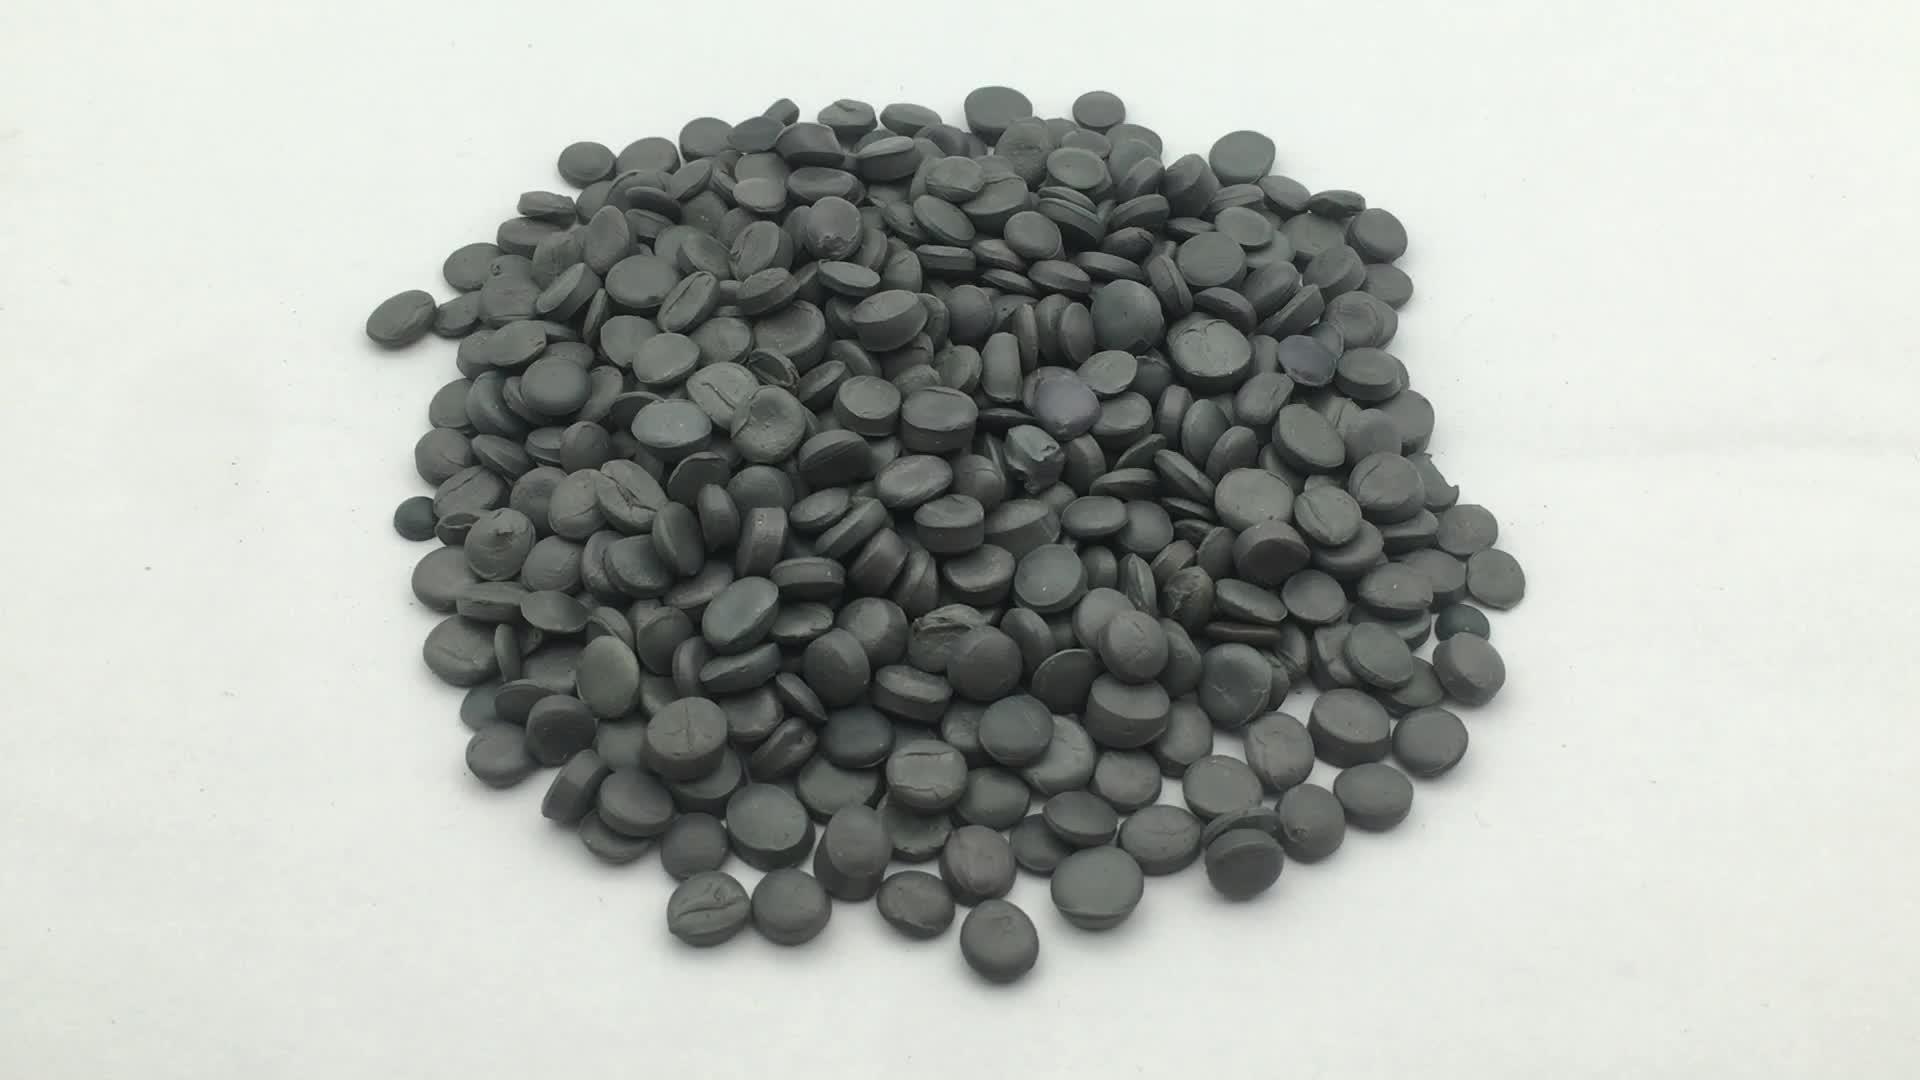 flexible wholesales black pvc compound granules rigid PVC granule for pvc pipe fitting